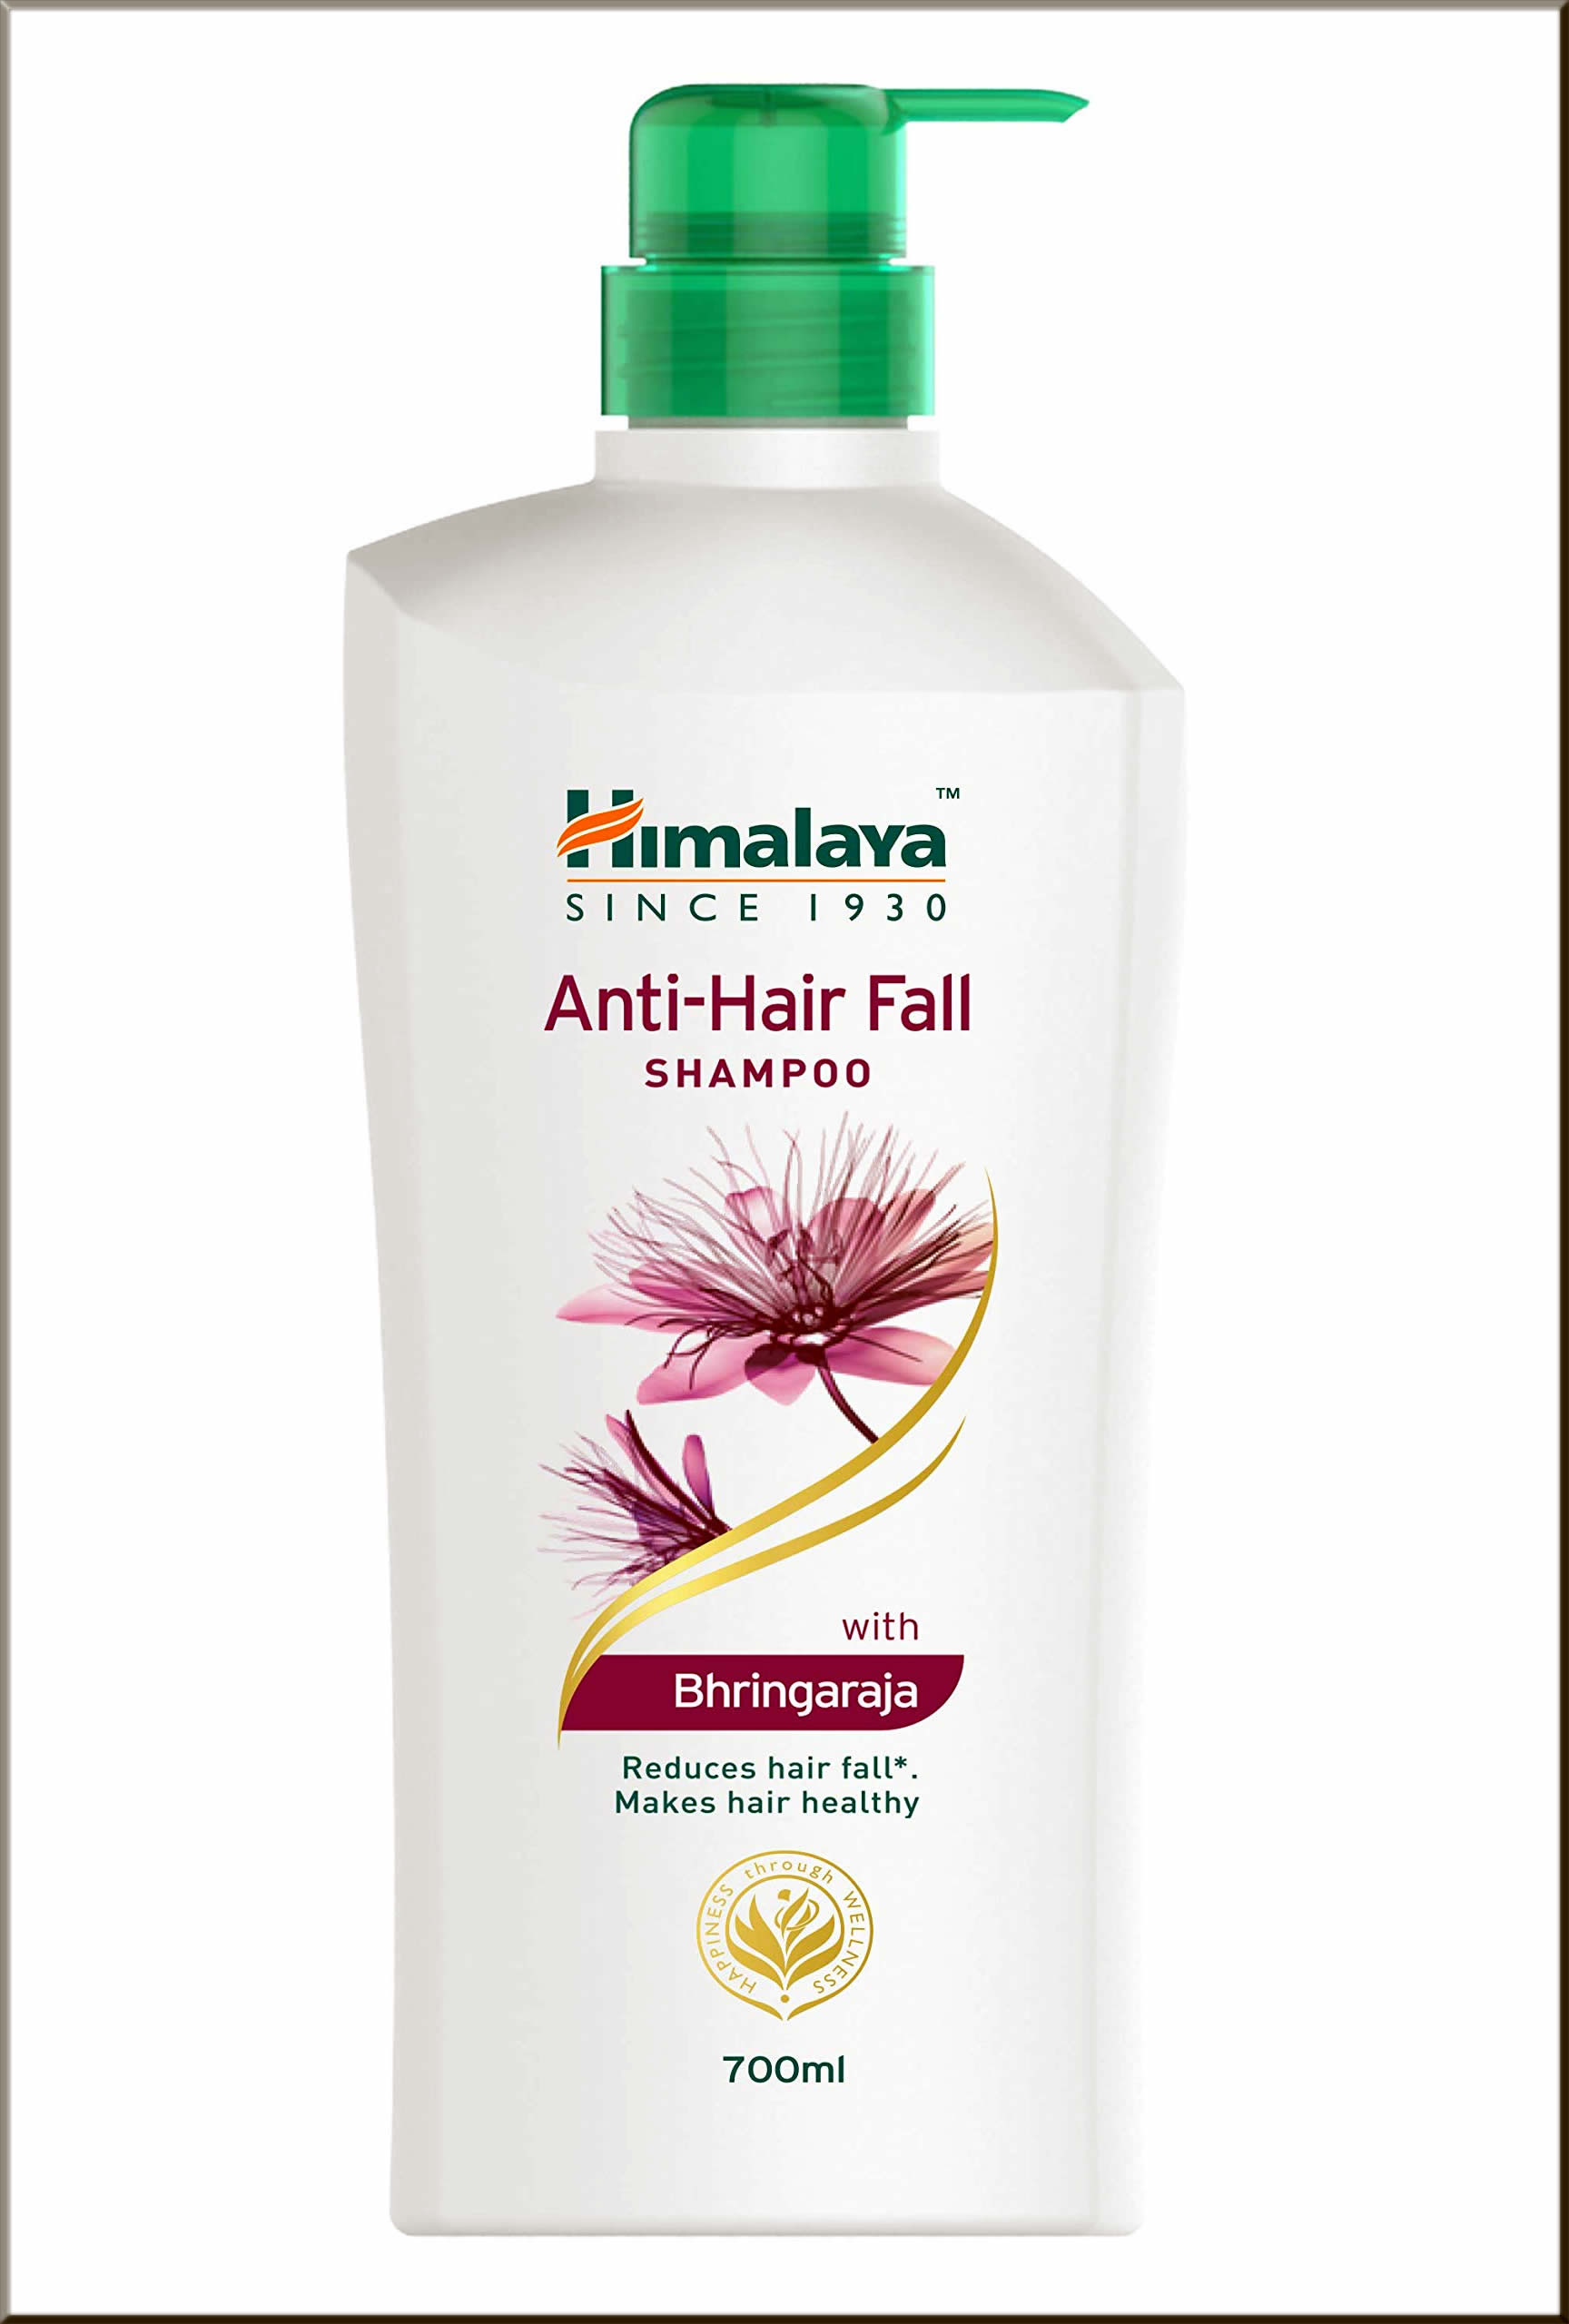 Himalaya Anti-hair Fall Shampoo